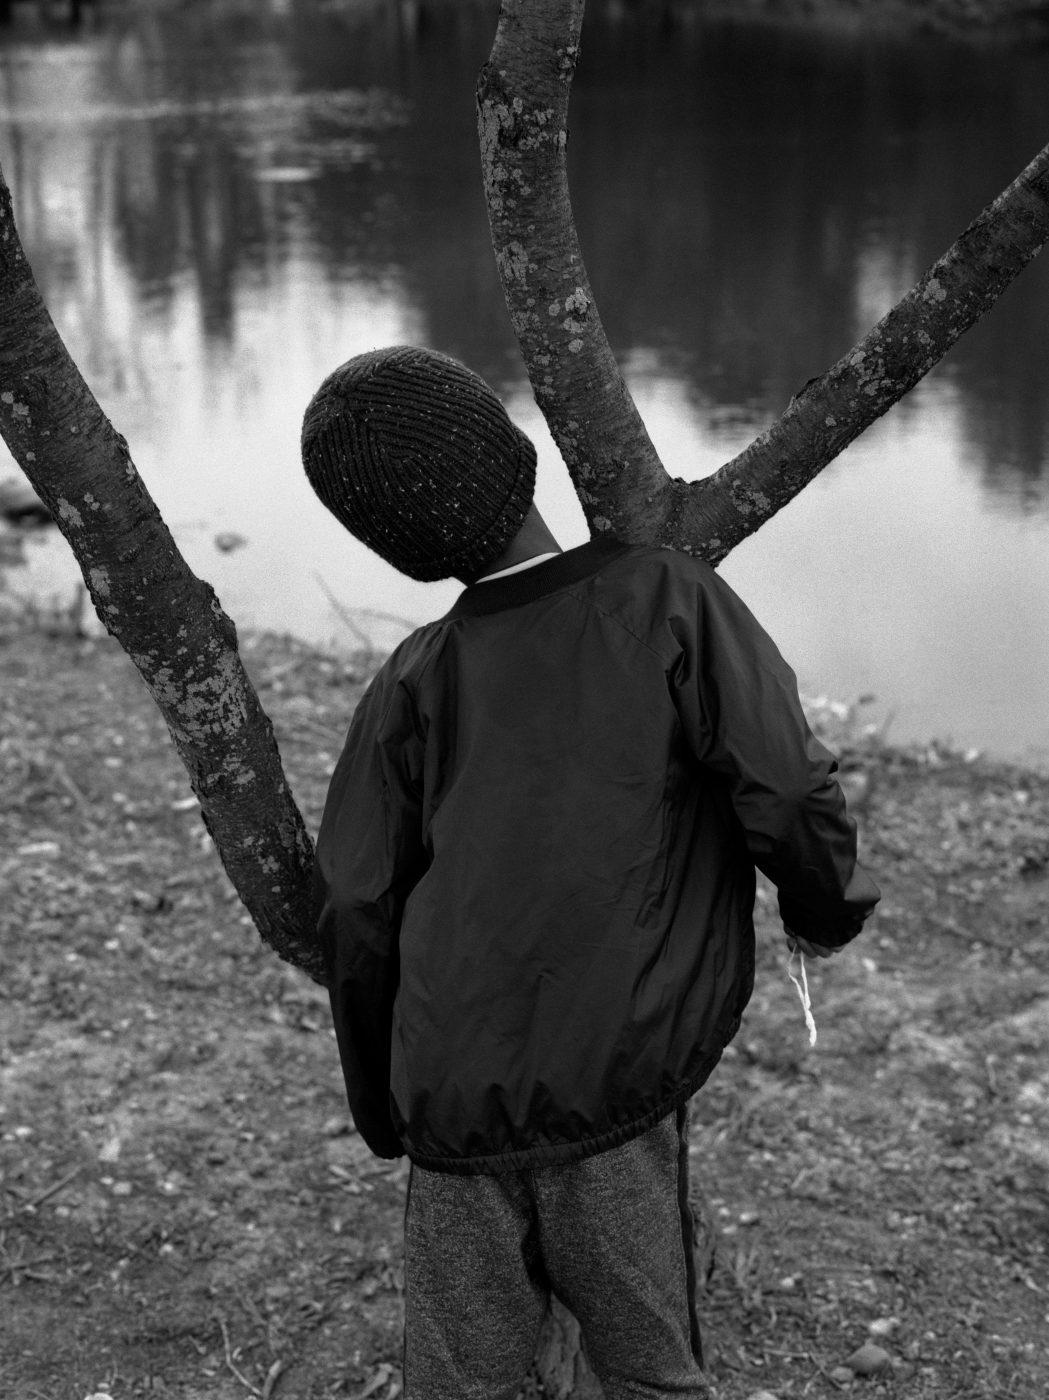 Boy and Tree by AL J Thompson